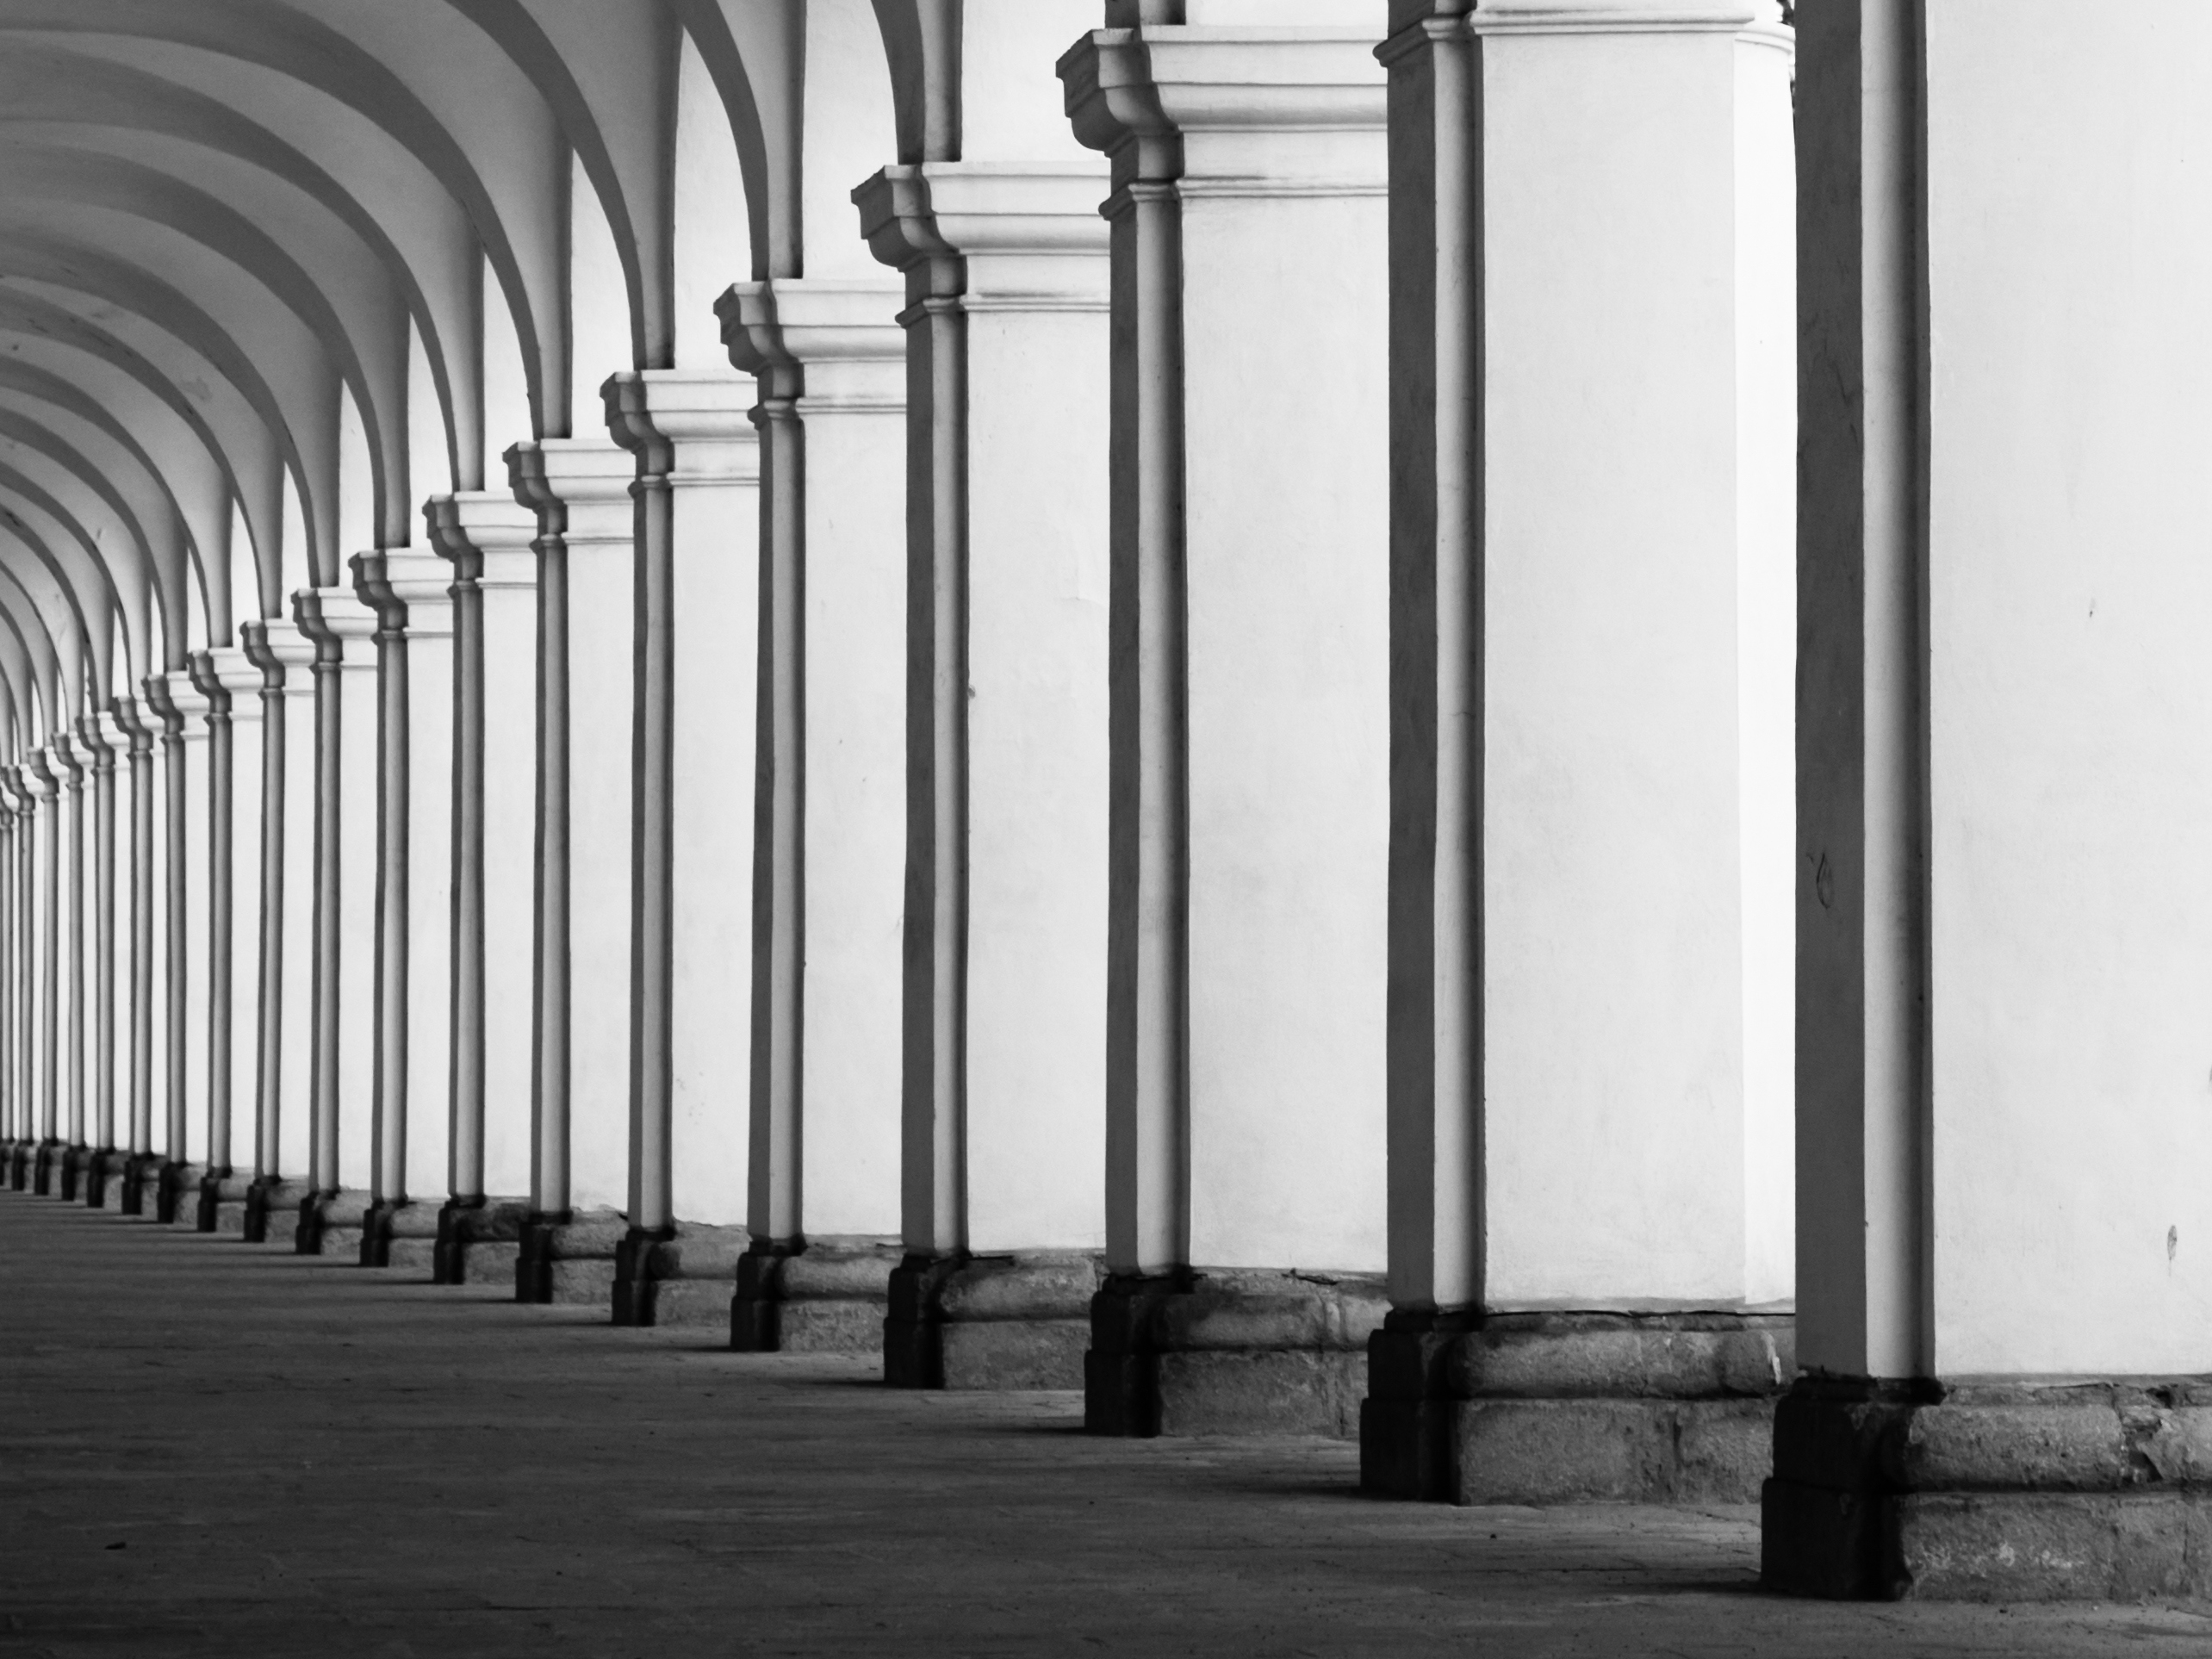 BW Pillars